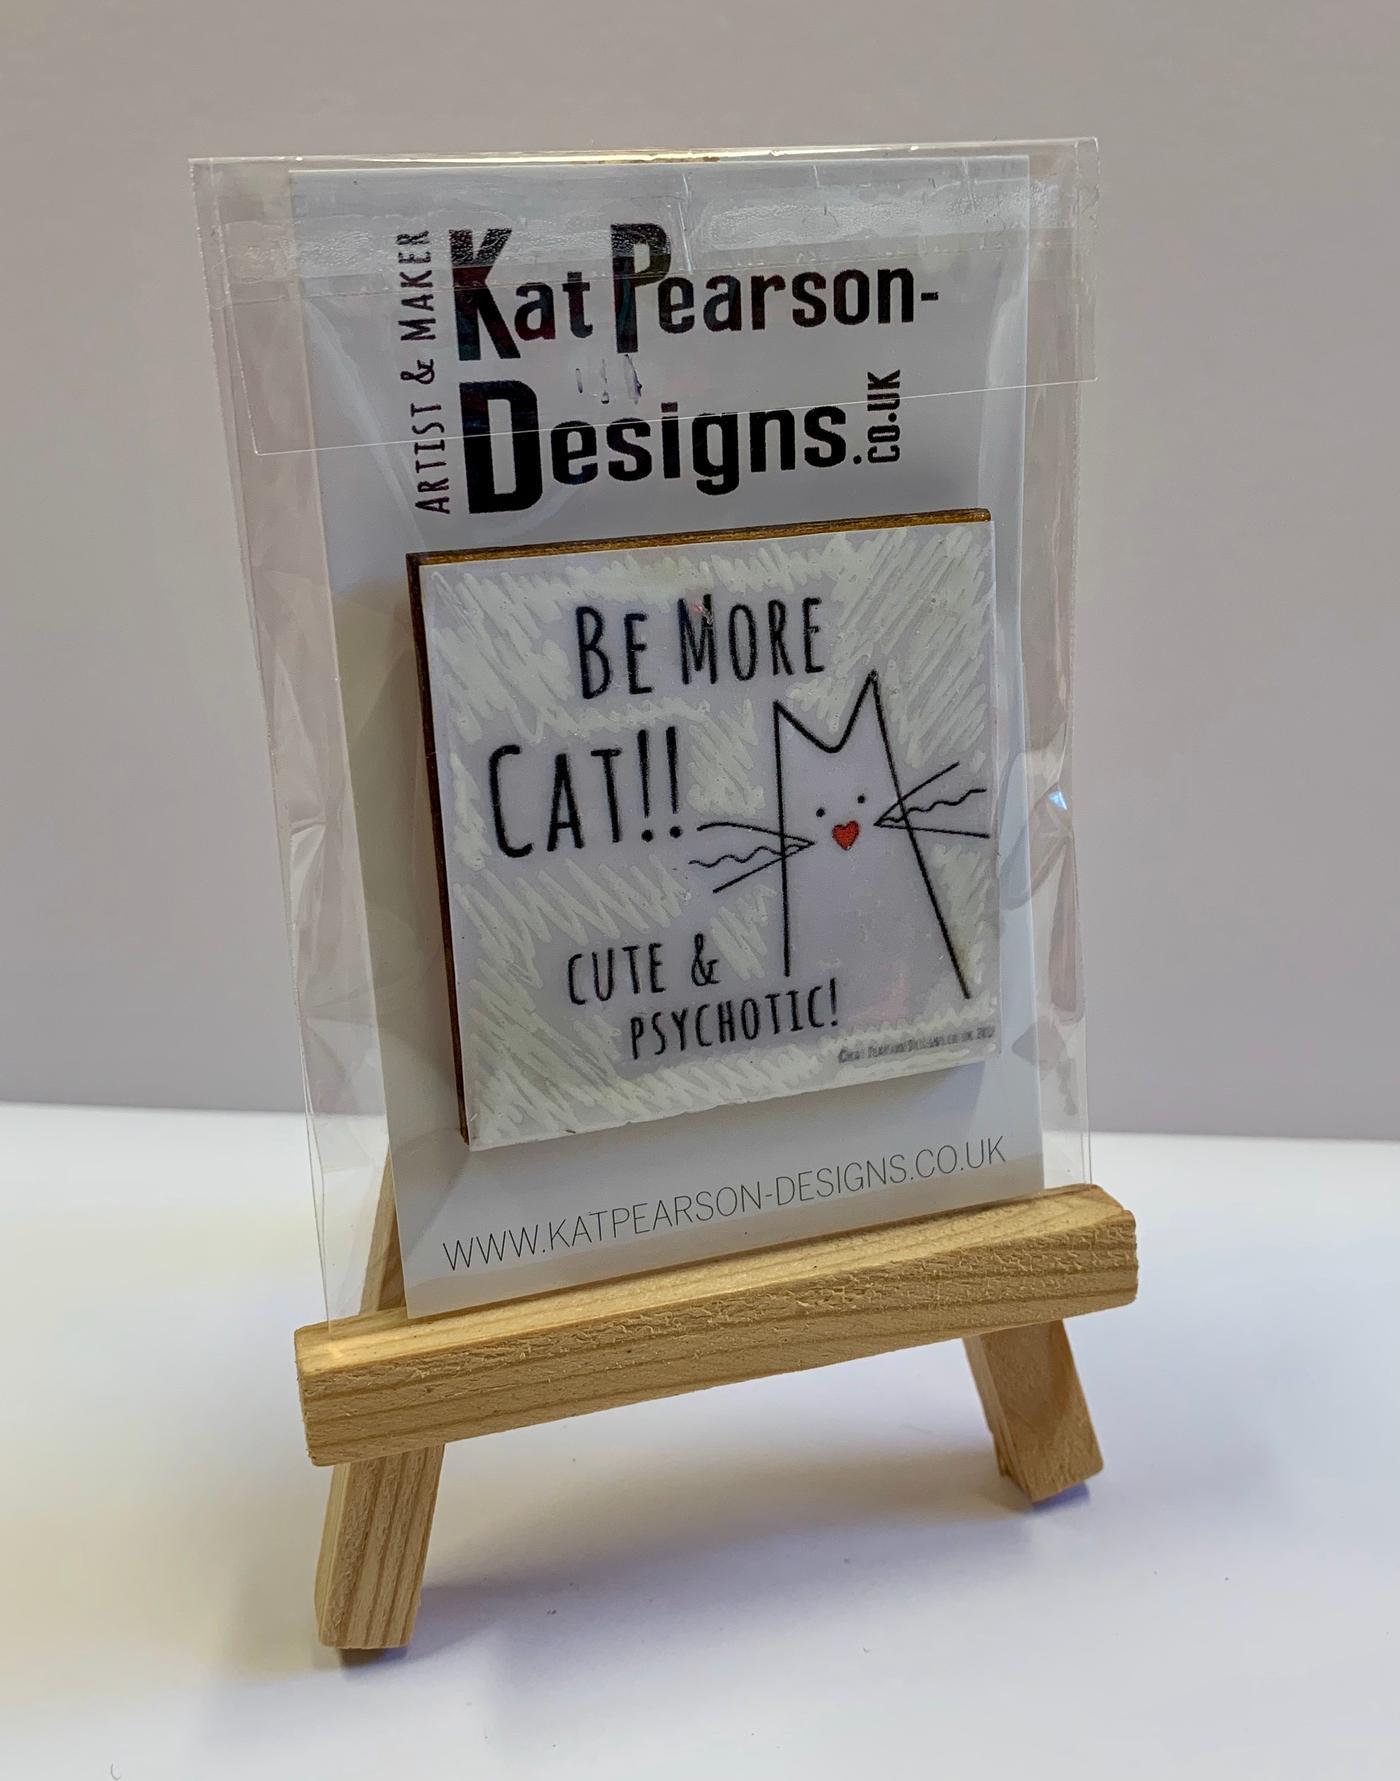 Kat Pearson Designs Fridge Magnet